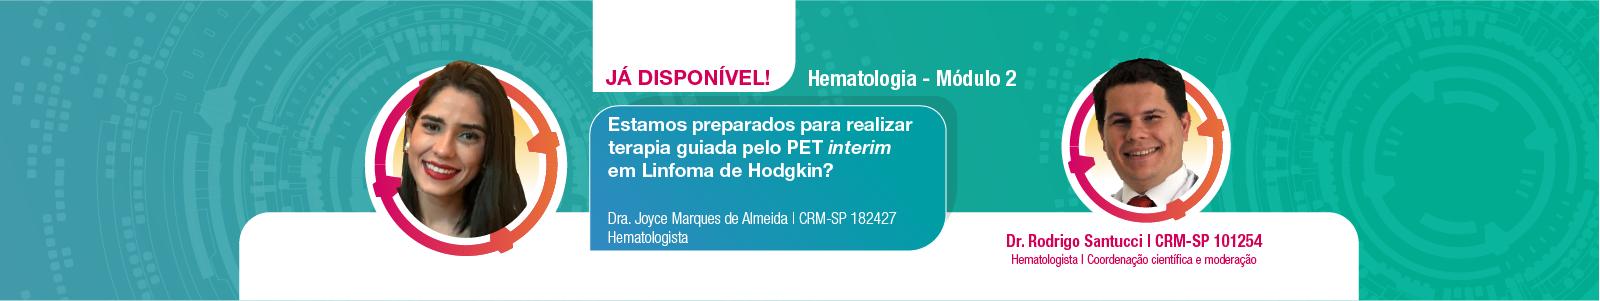 Aulas-banners-hematologia-Módulo 2 Oncologia é hoje